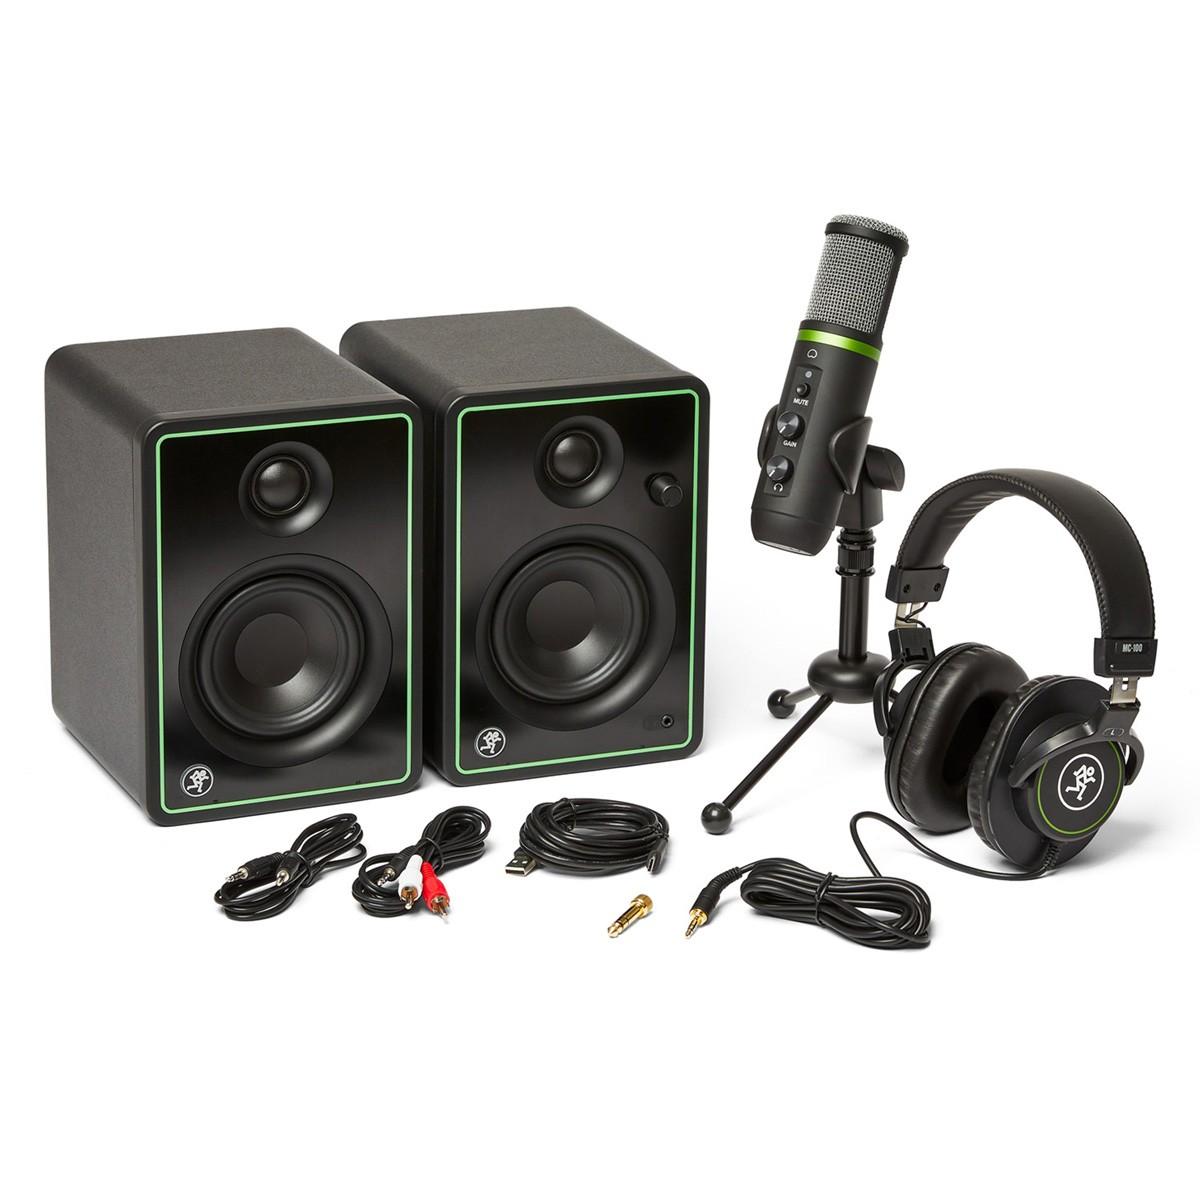 CREATOR-BUNDLE - MACKIE - KIT COM CR3X, EM-USB E MC100